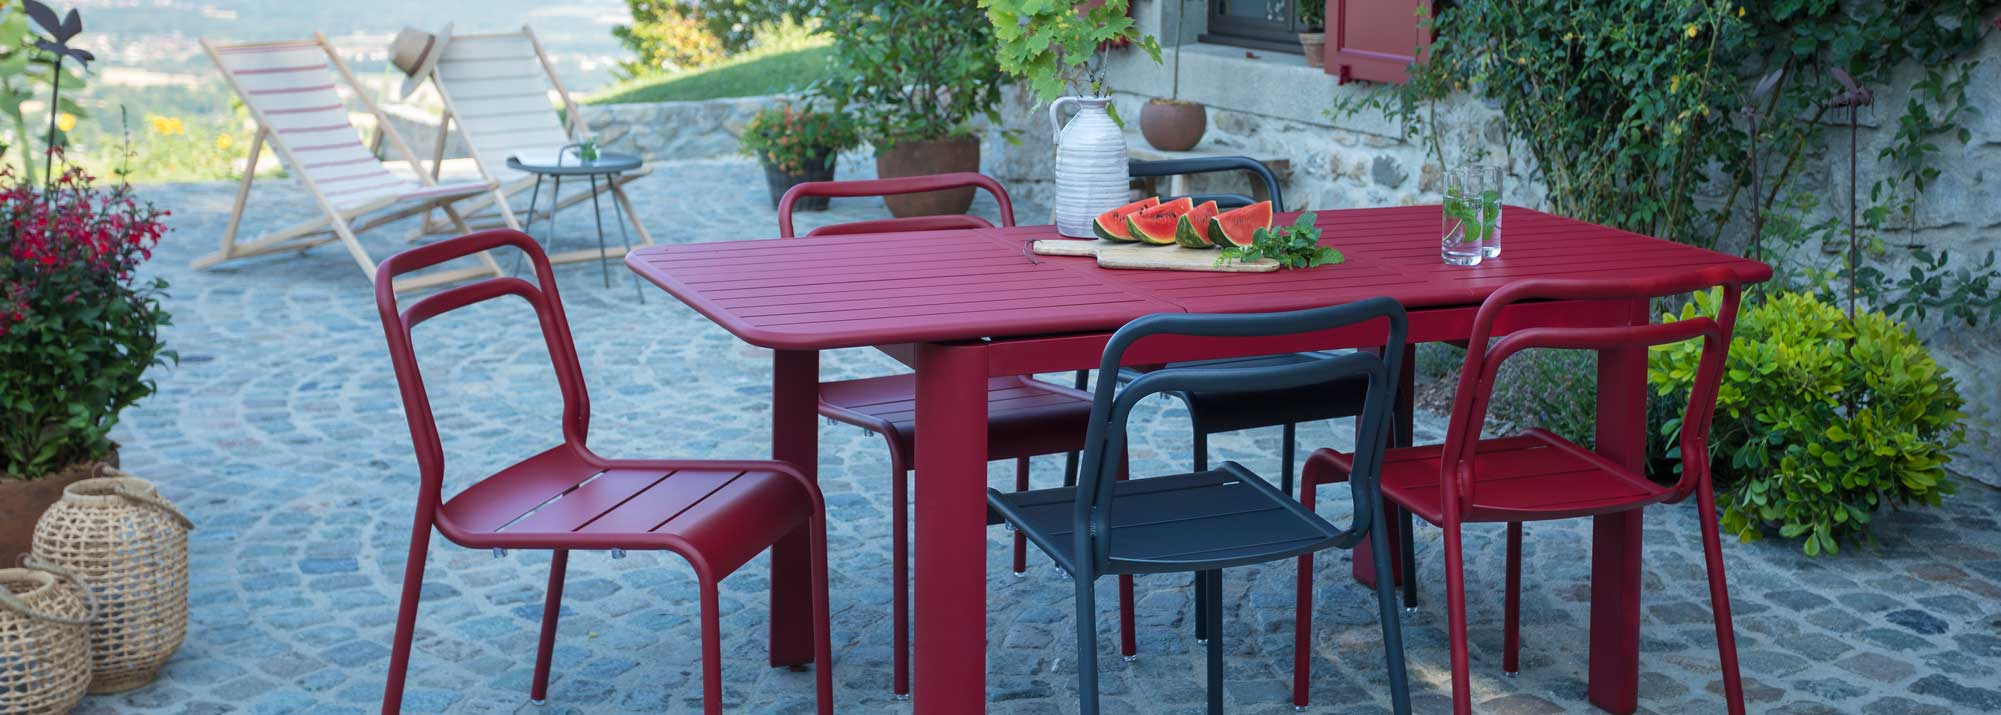 Table De Jardin : Botanic®, Tables De Jardin En Aluminium ... à Table Et Chaise De Jardin Solde